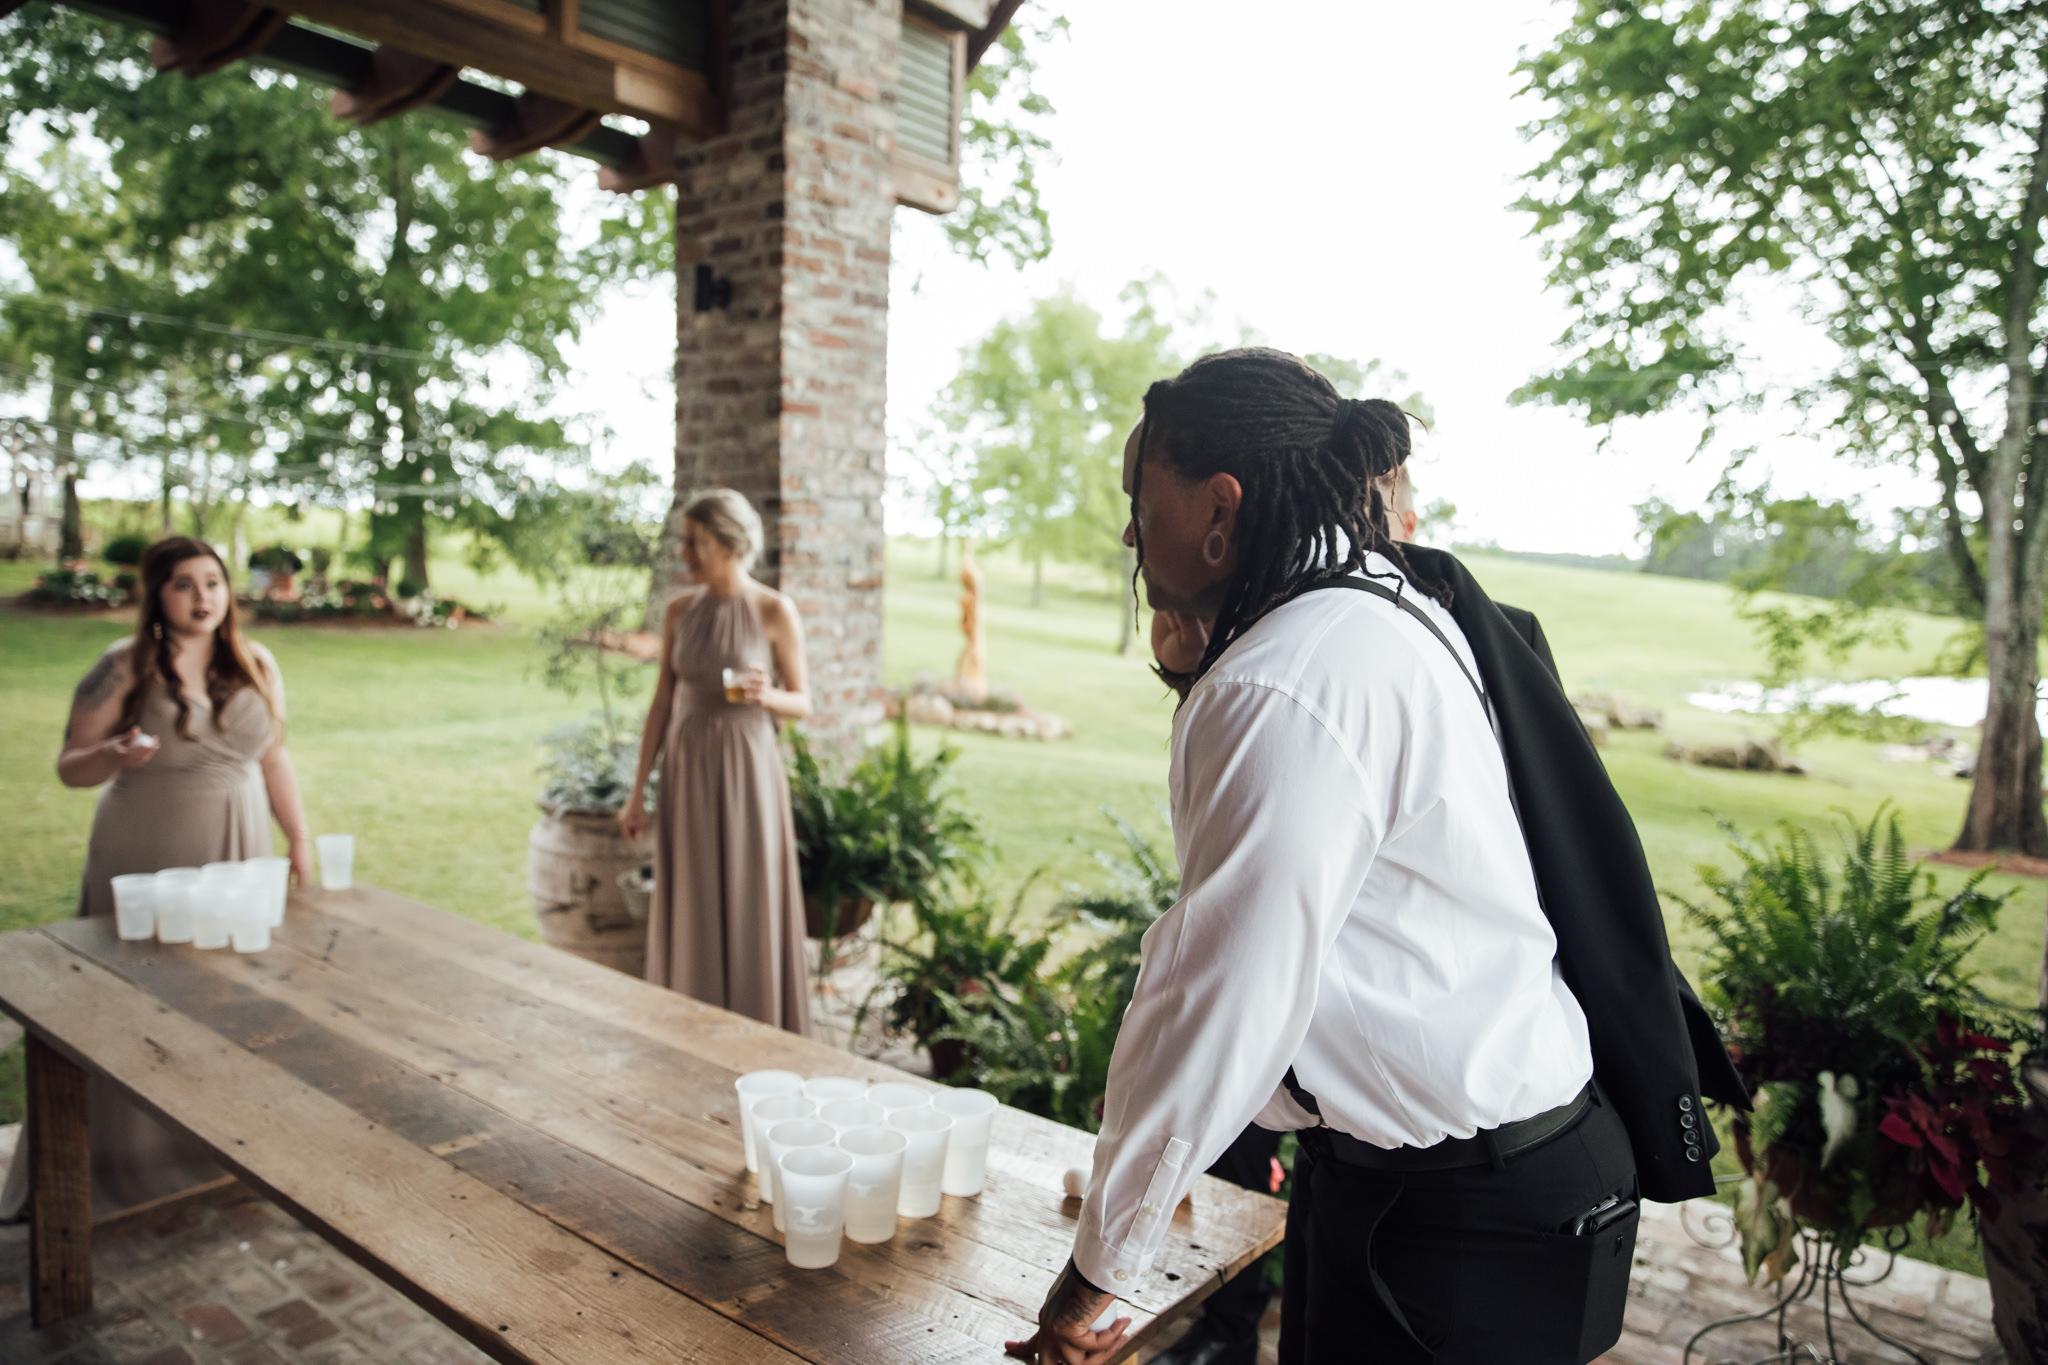 phantom-canyon-brewery-colorado-springs-wedding-photographer-317.jpg